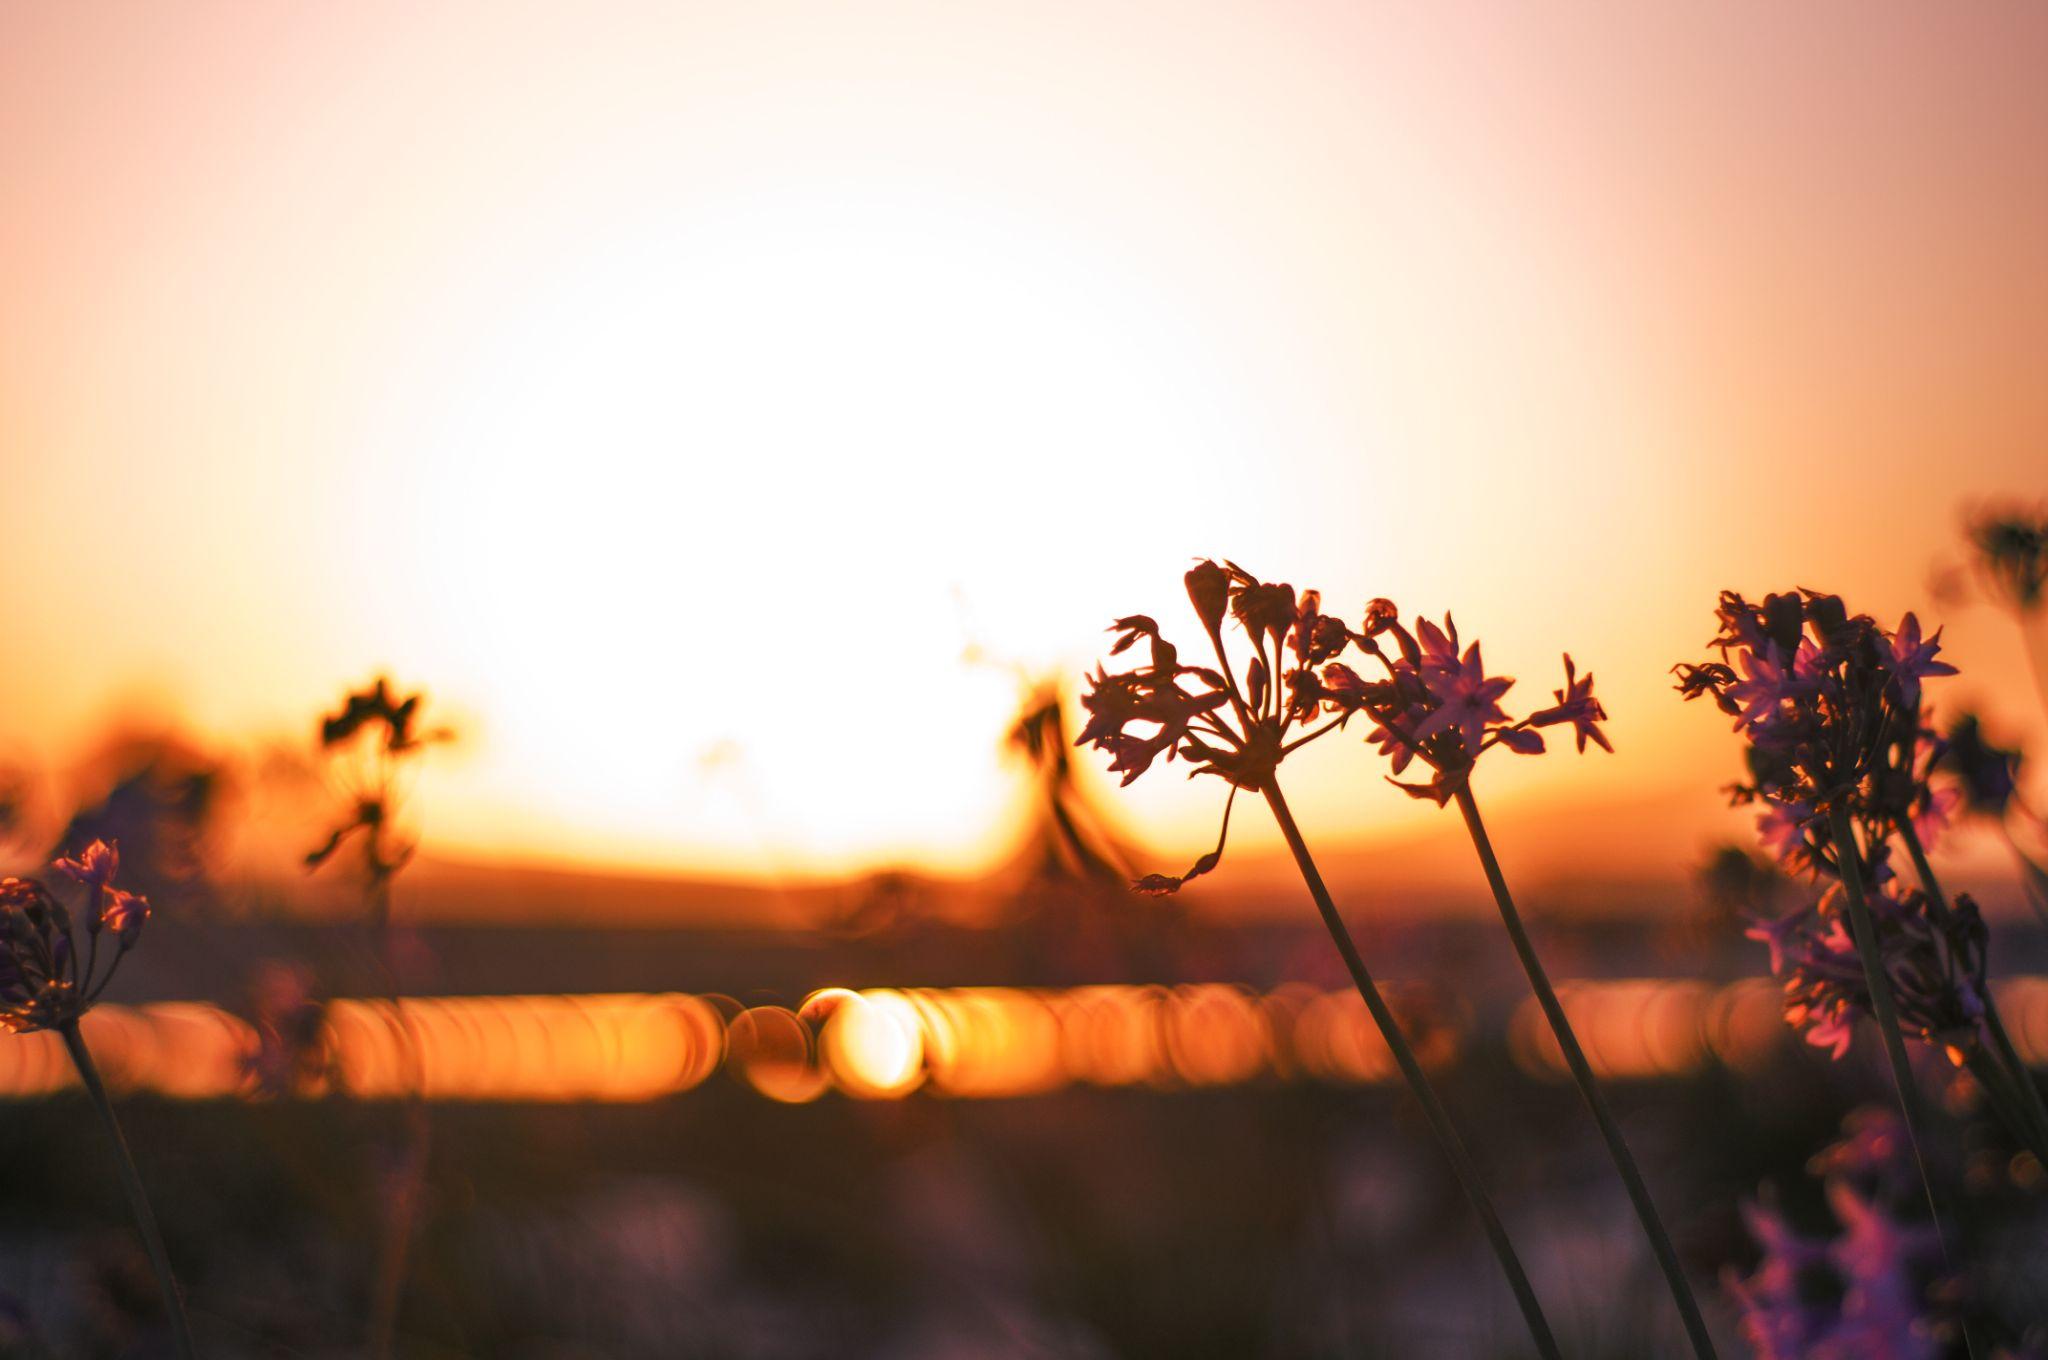 Sunset in Mogador by Tariq Ouhti